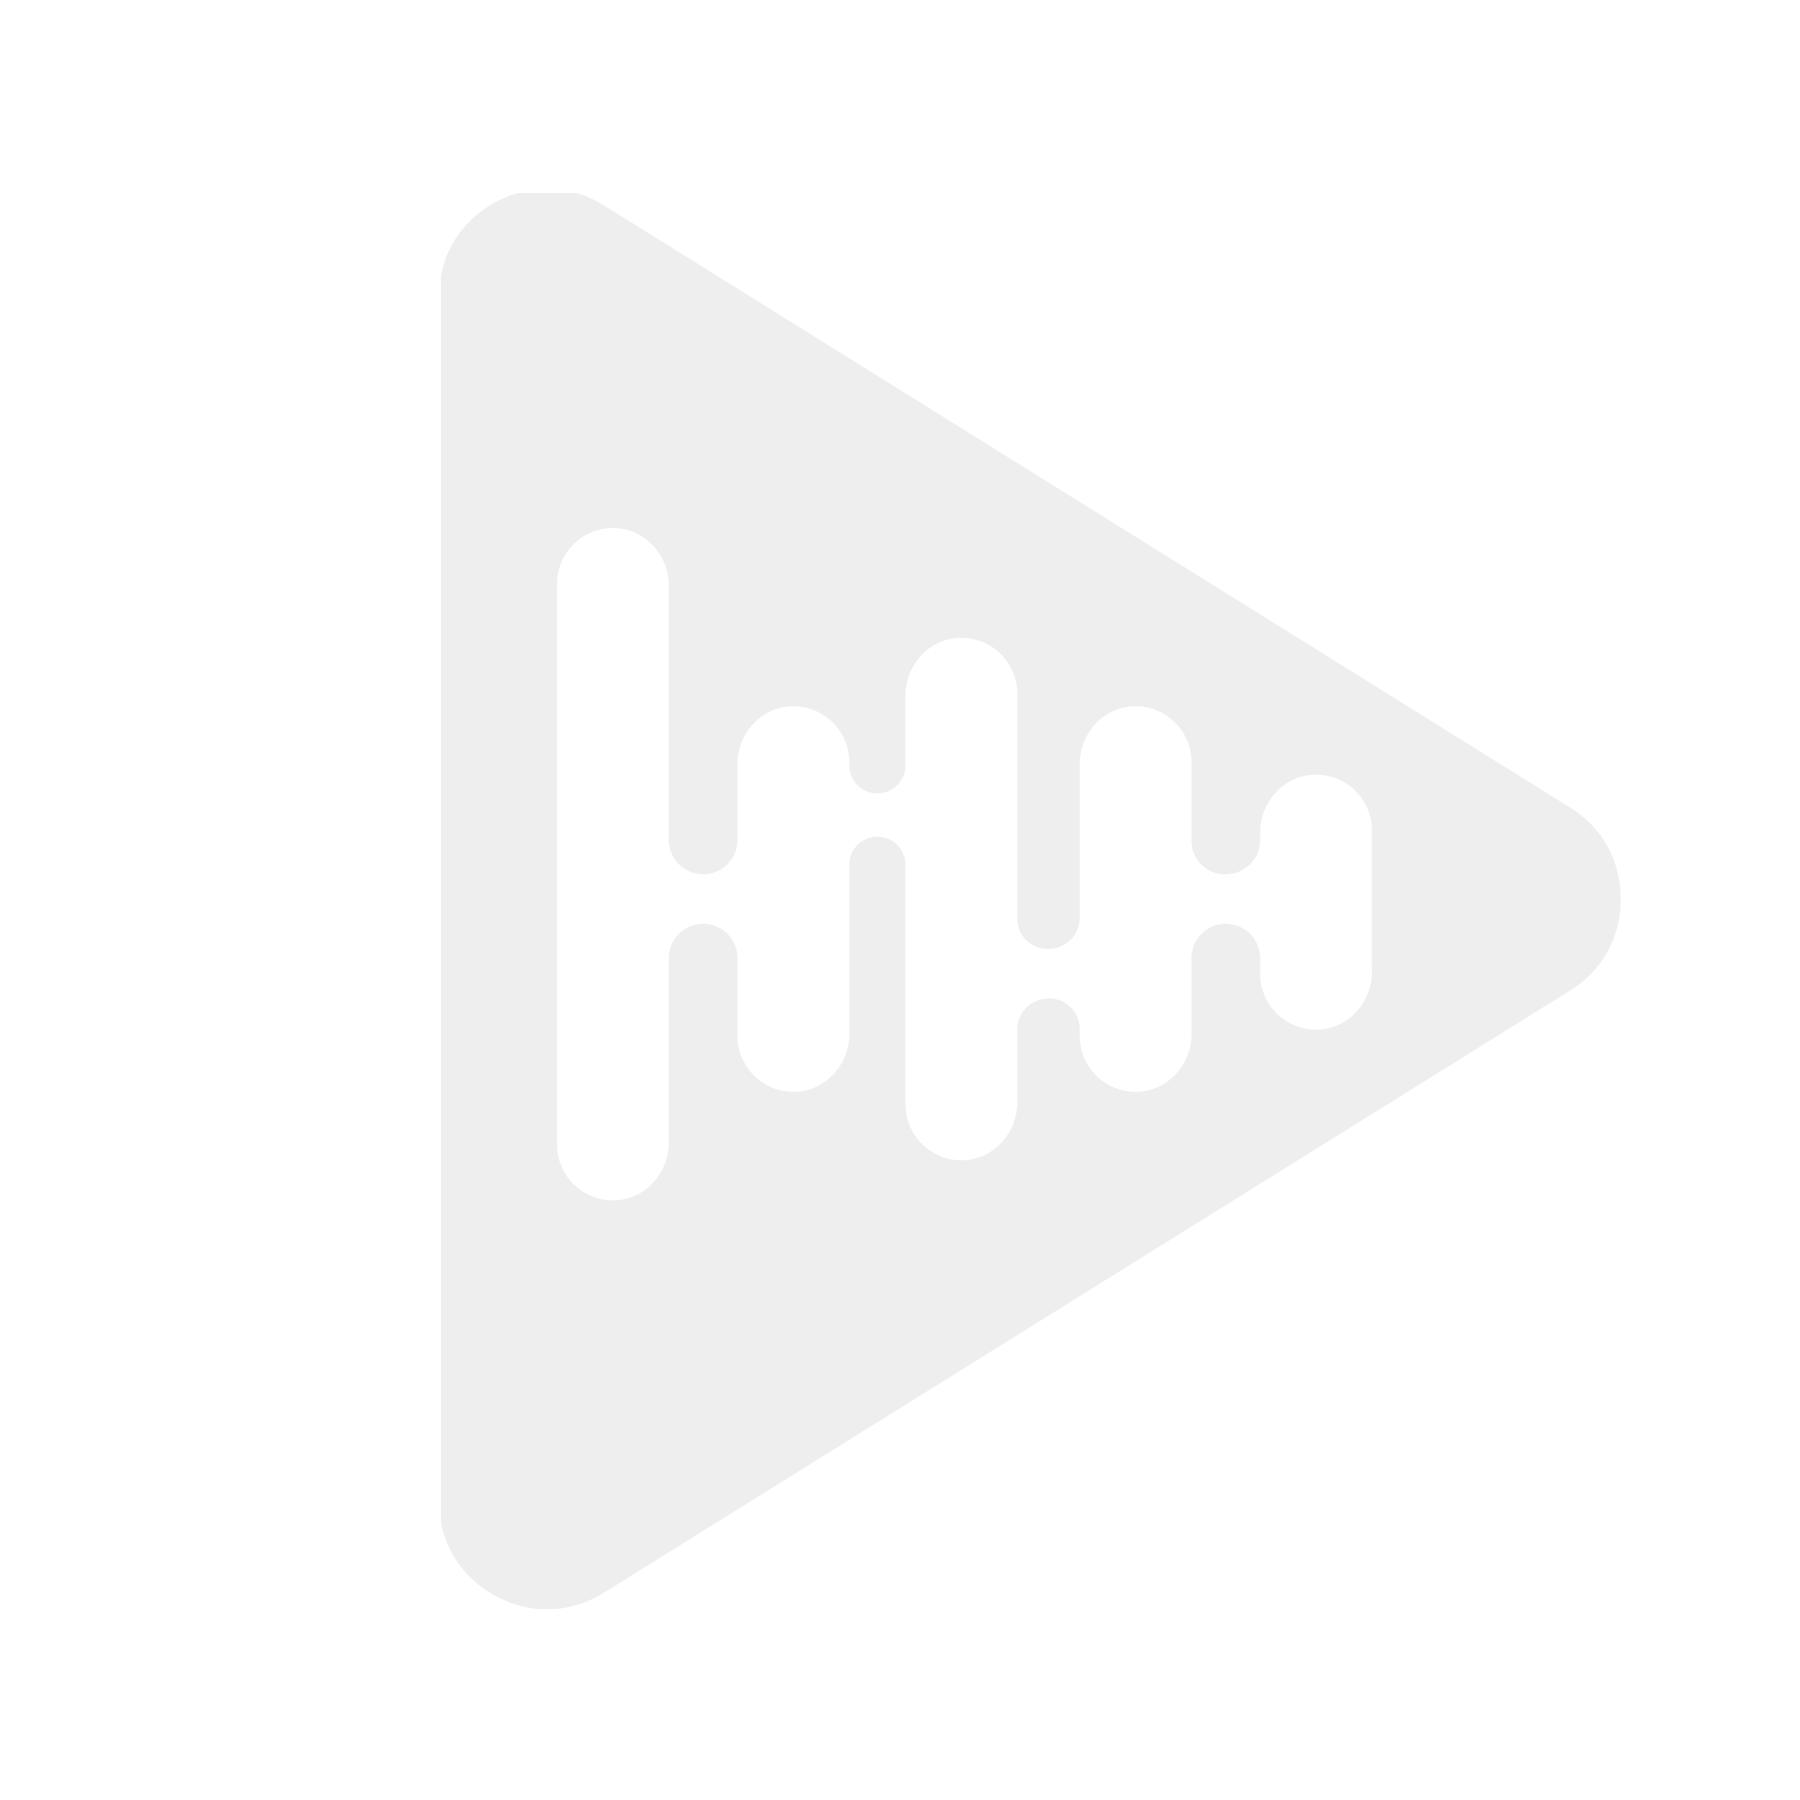 Grandview 148604 - Lerret Cyber, 16:9, 171x96, Manuelt 77